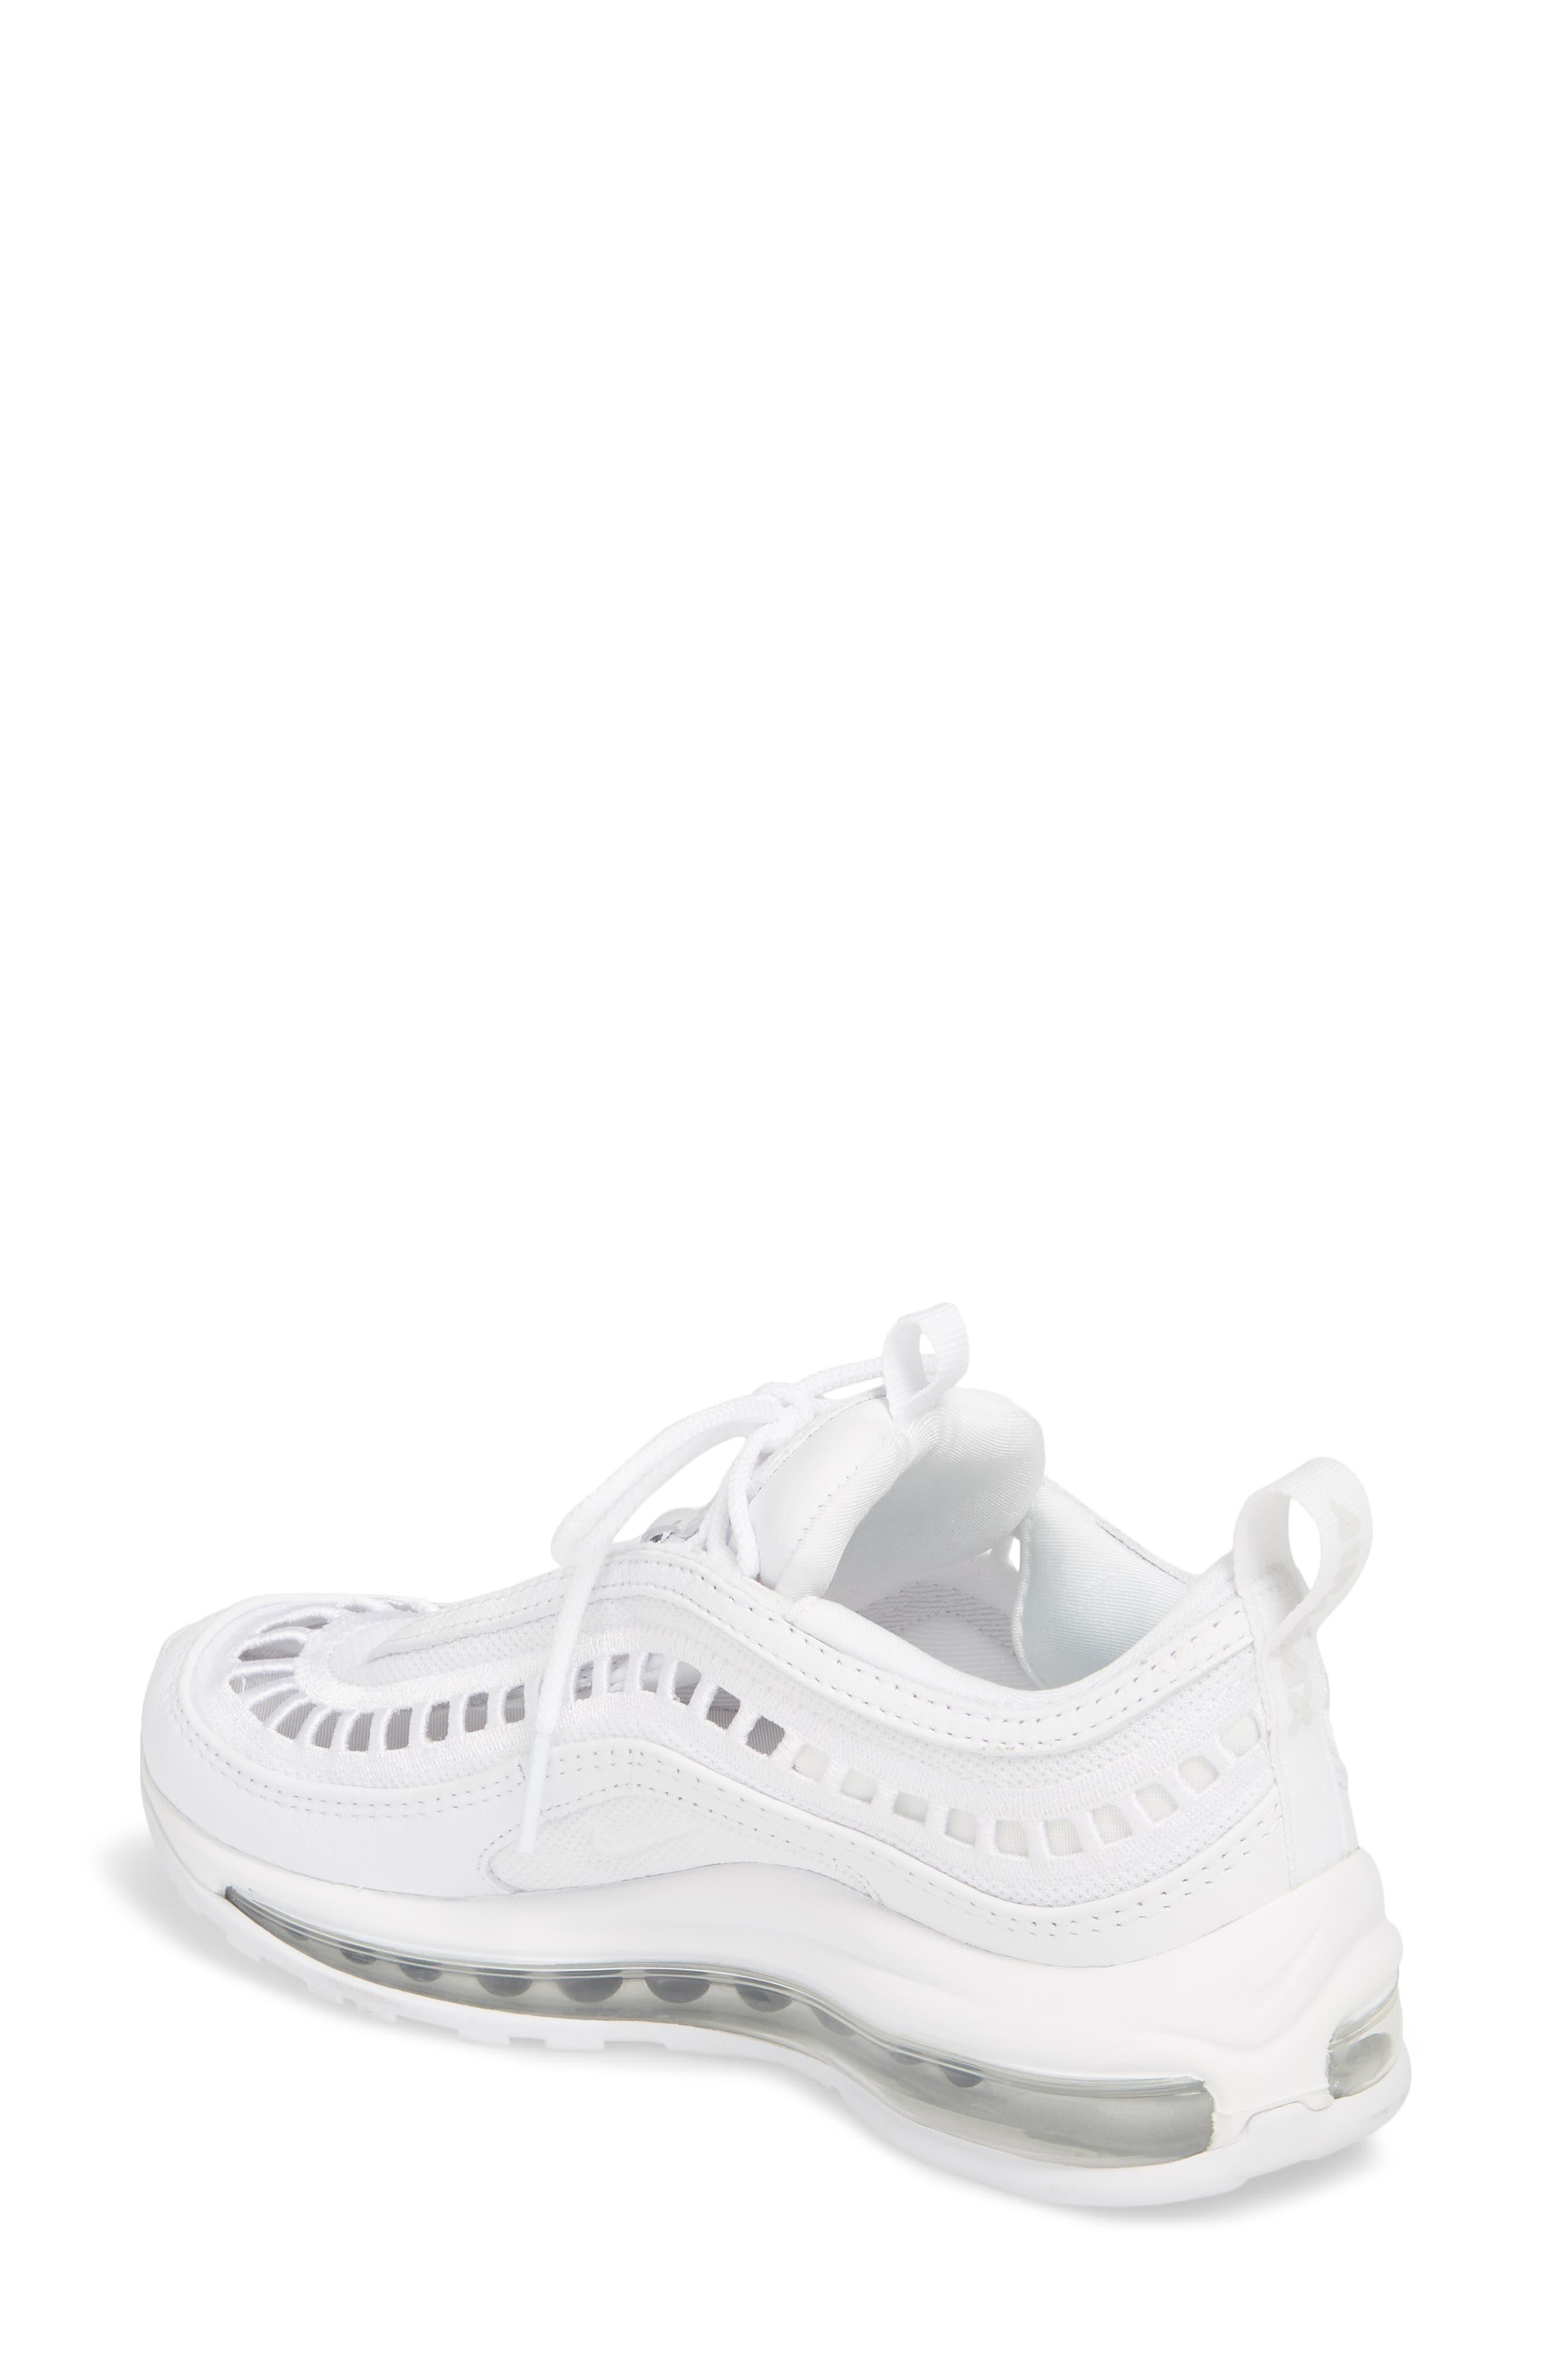 Air Max 97 Ultra '17 SI Sneaker,                             Alternate thumbnail 2, color,                             WHITE/ WHITE/ VAST GREY